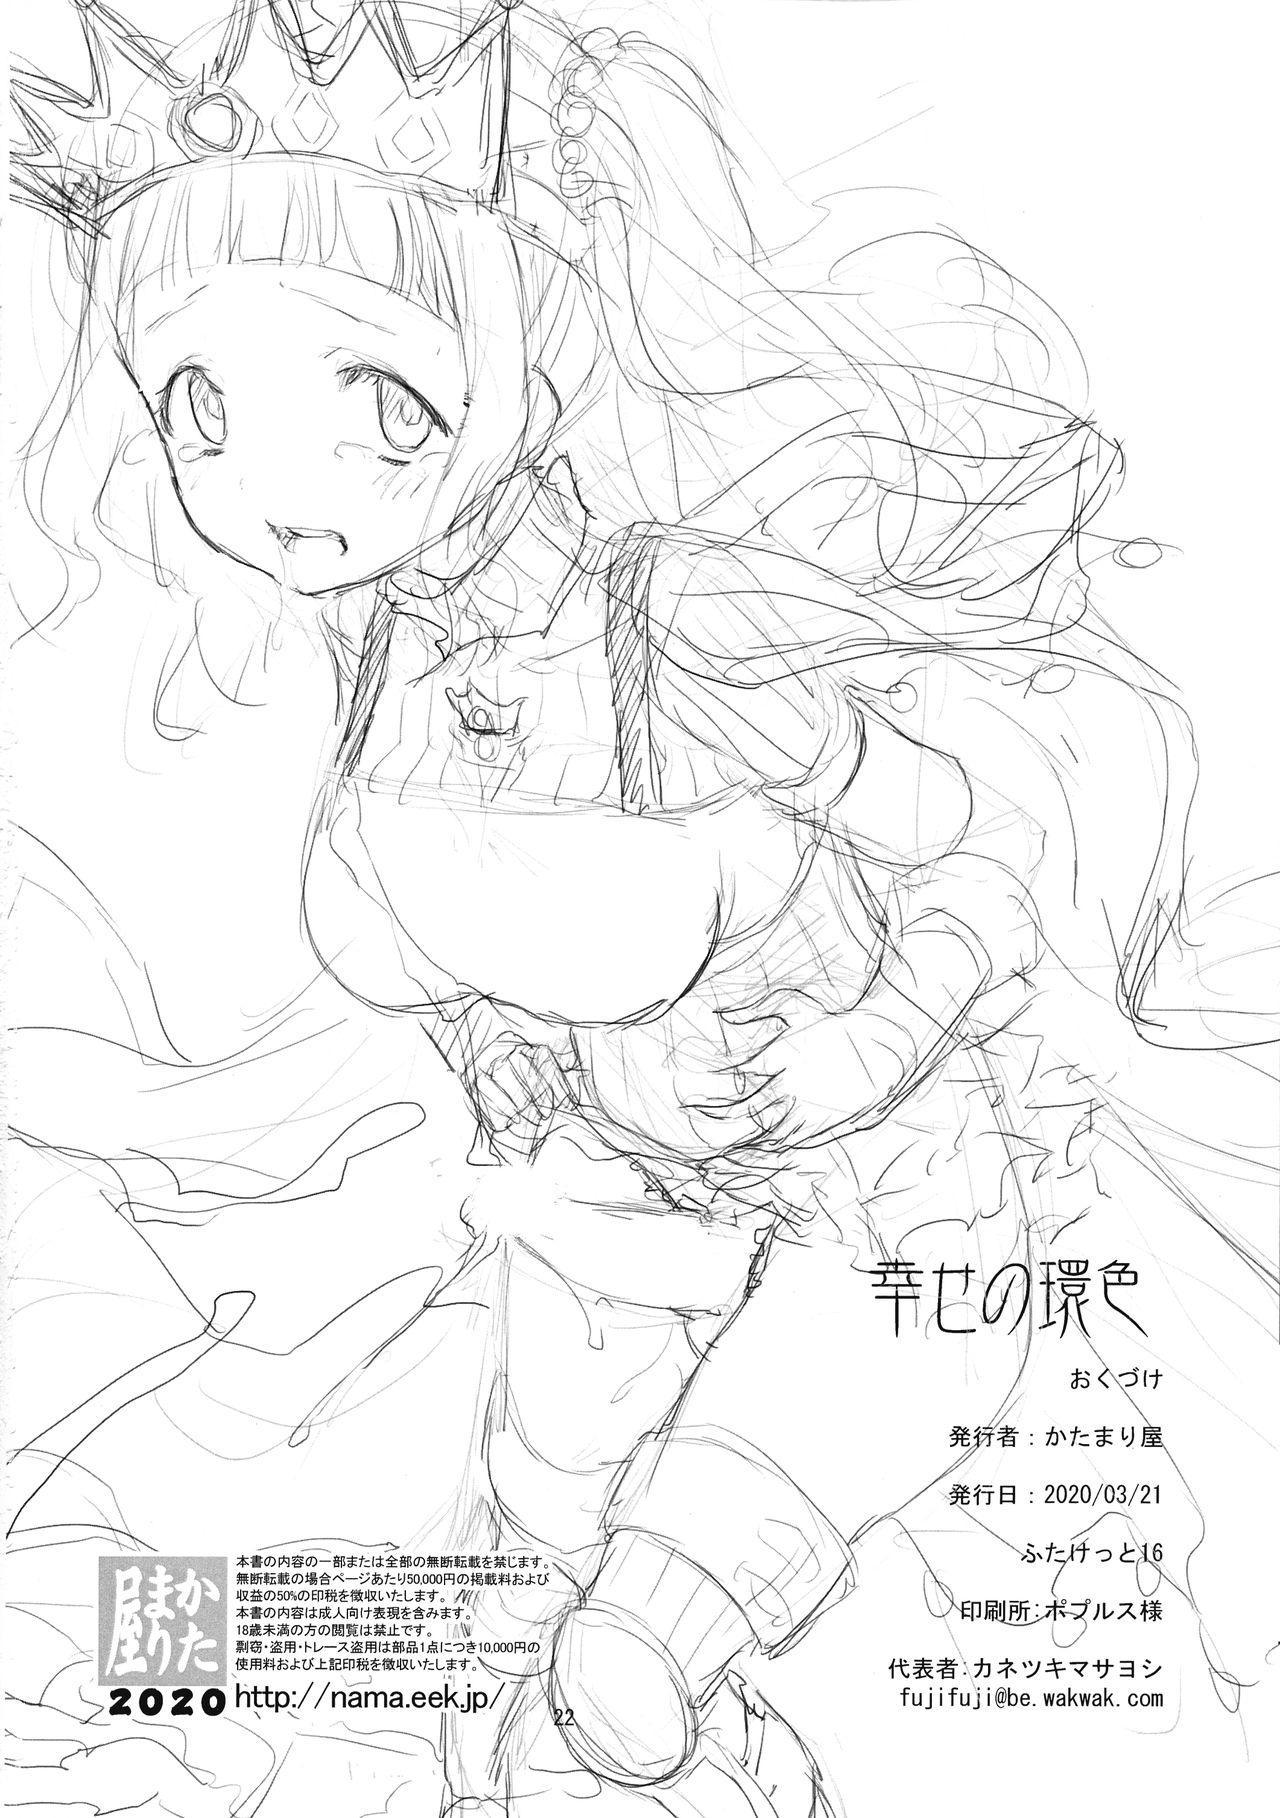 [KATAMARI-YA (Shinama)] Shiawase-no-Tamaki-iro (Puella Magi Madoka Magica Side Story: Magia Record) [Chinese] [靴下汉化组] 20